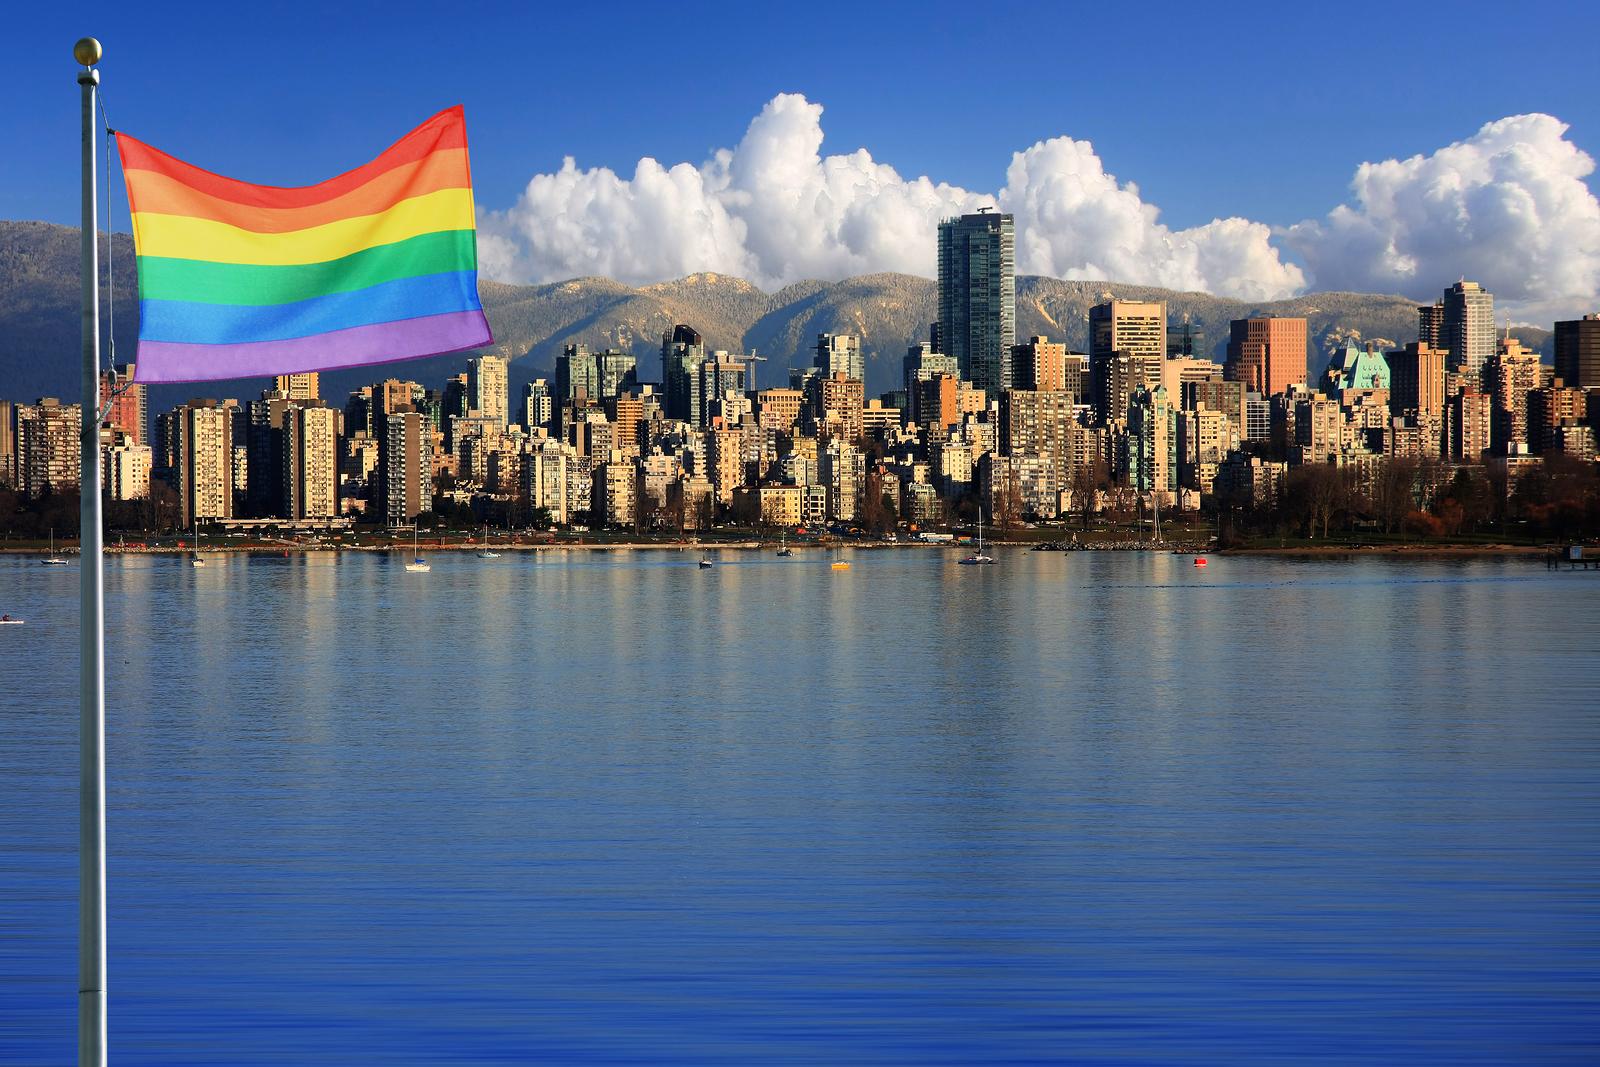 NerdWallet Lists Top 10 LGBT-Friendly Cities in the U.S